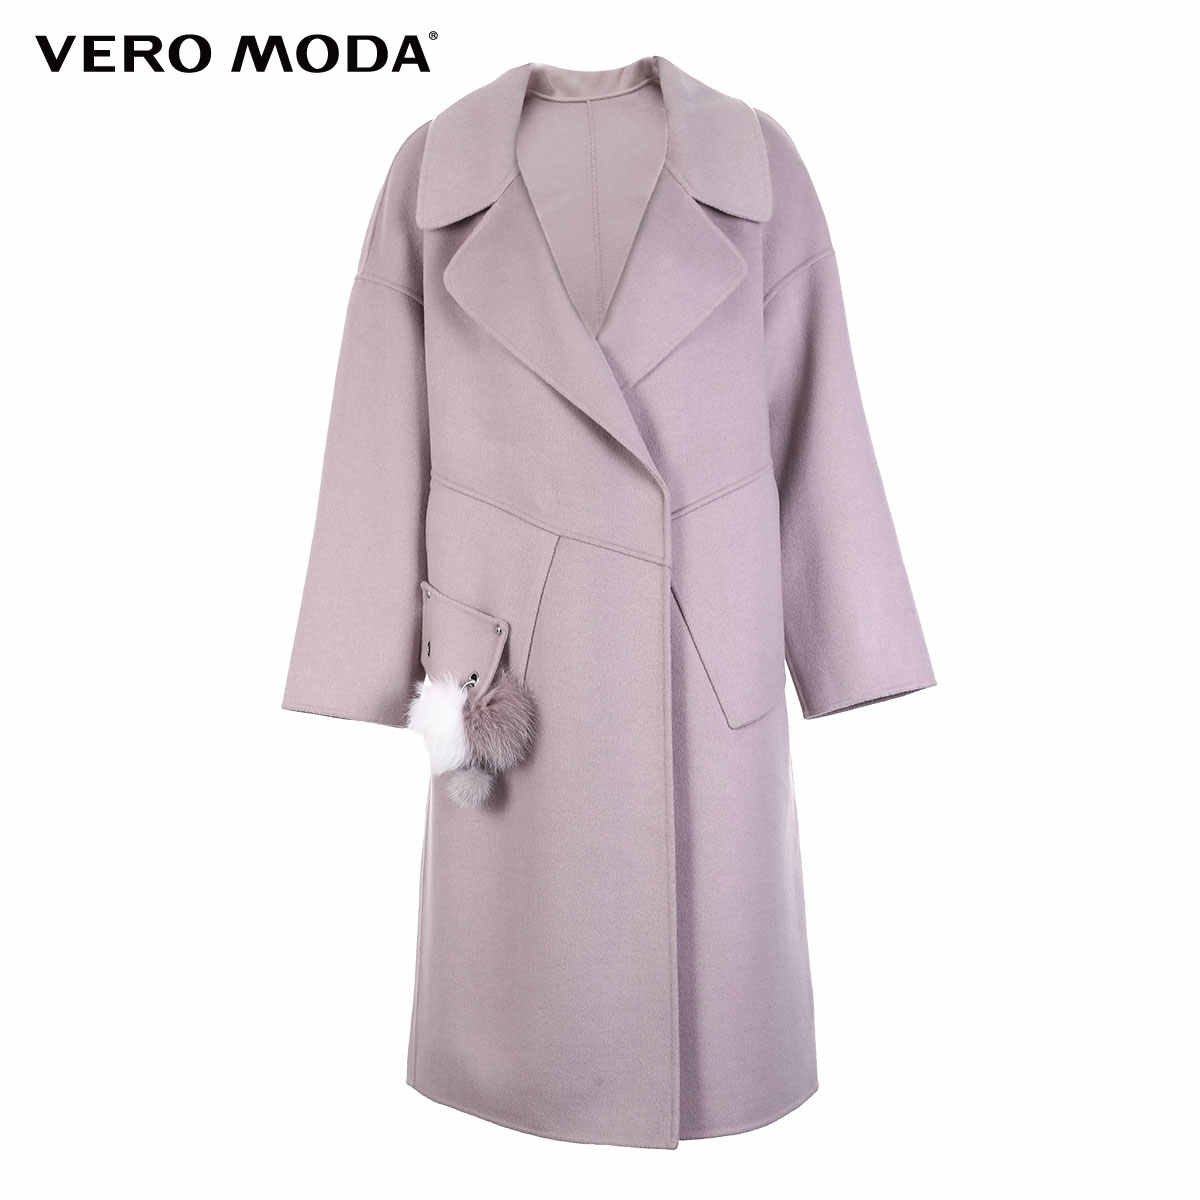 Vero Moda 100% Wol Dubbelzijdig Enkele Knop Oversize Wollen Jas   318327503